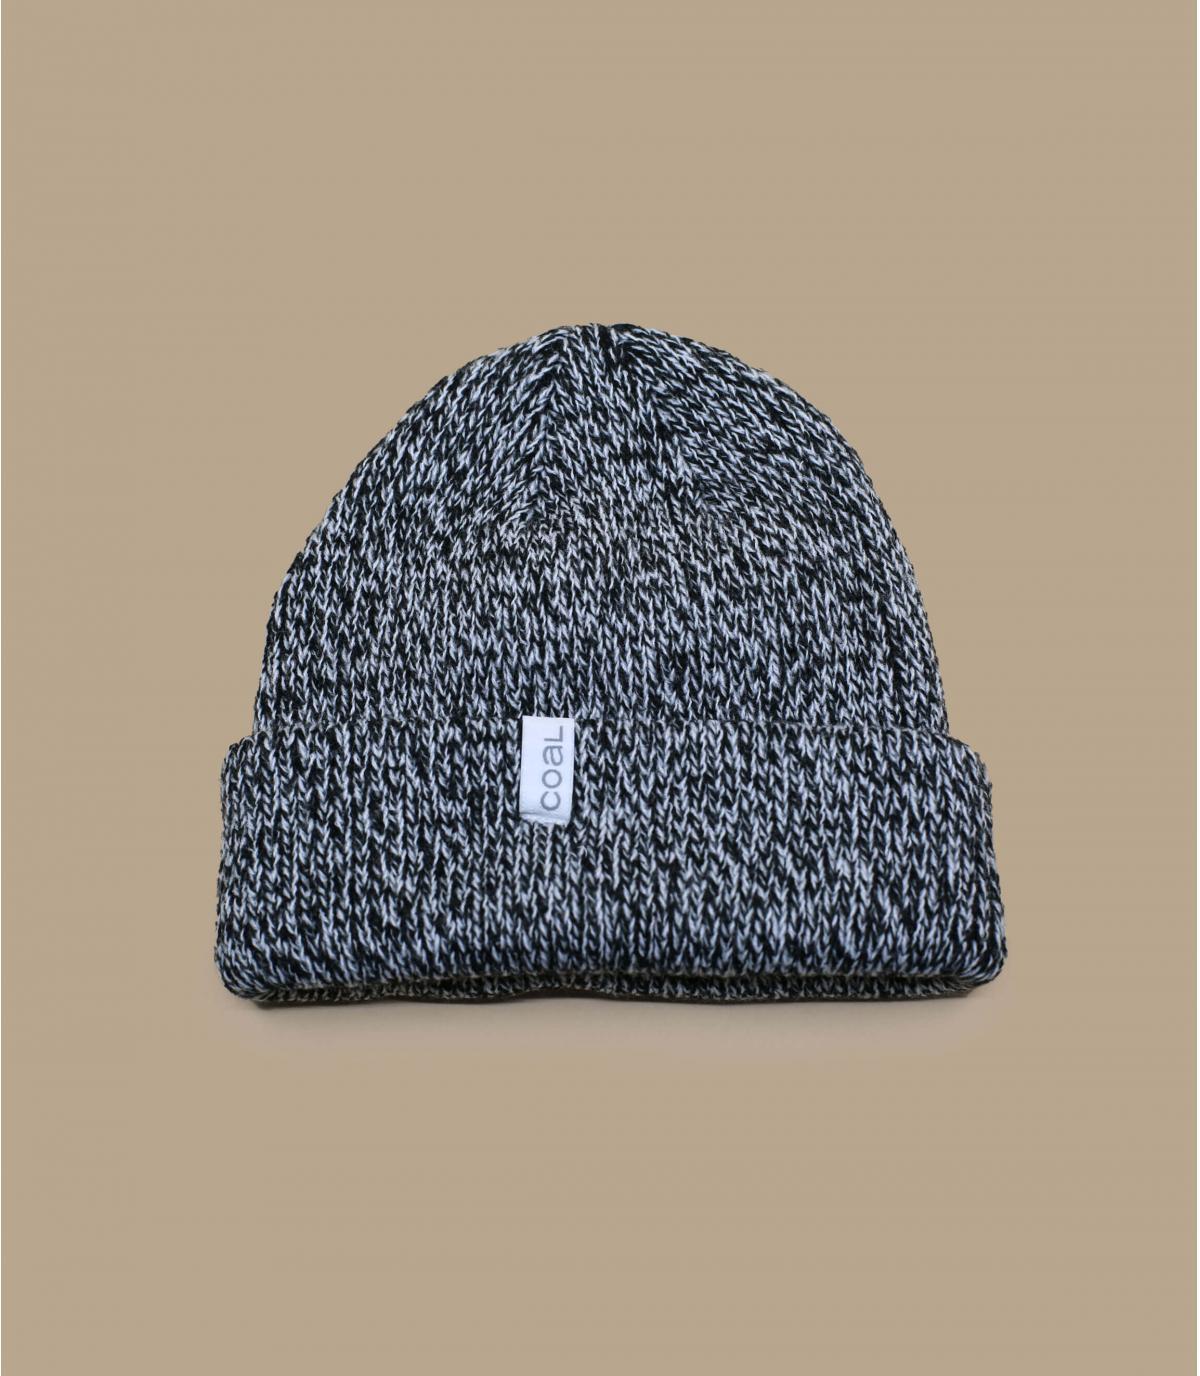 Mütze Rand schwarz meliert Coal